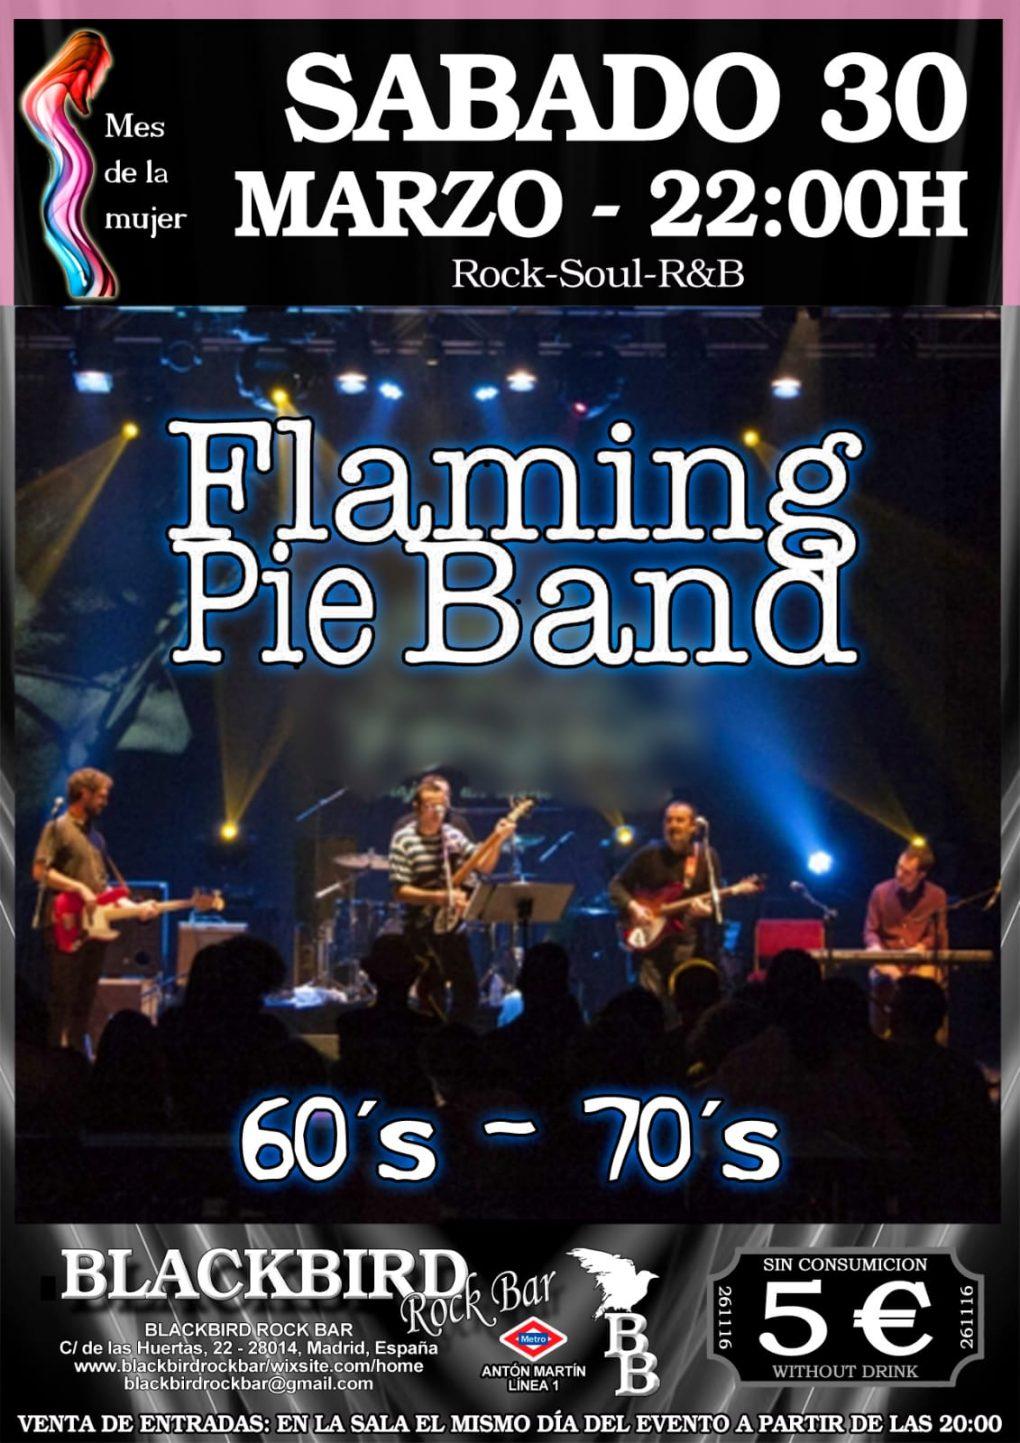 FLAMING PIE BAND VERSIONES POP ROCK SOUL 60 70 MADRID EN BLACKBIRD